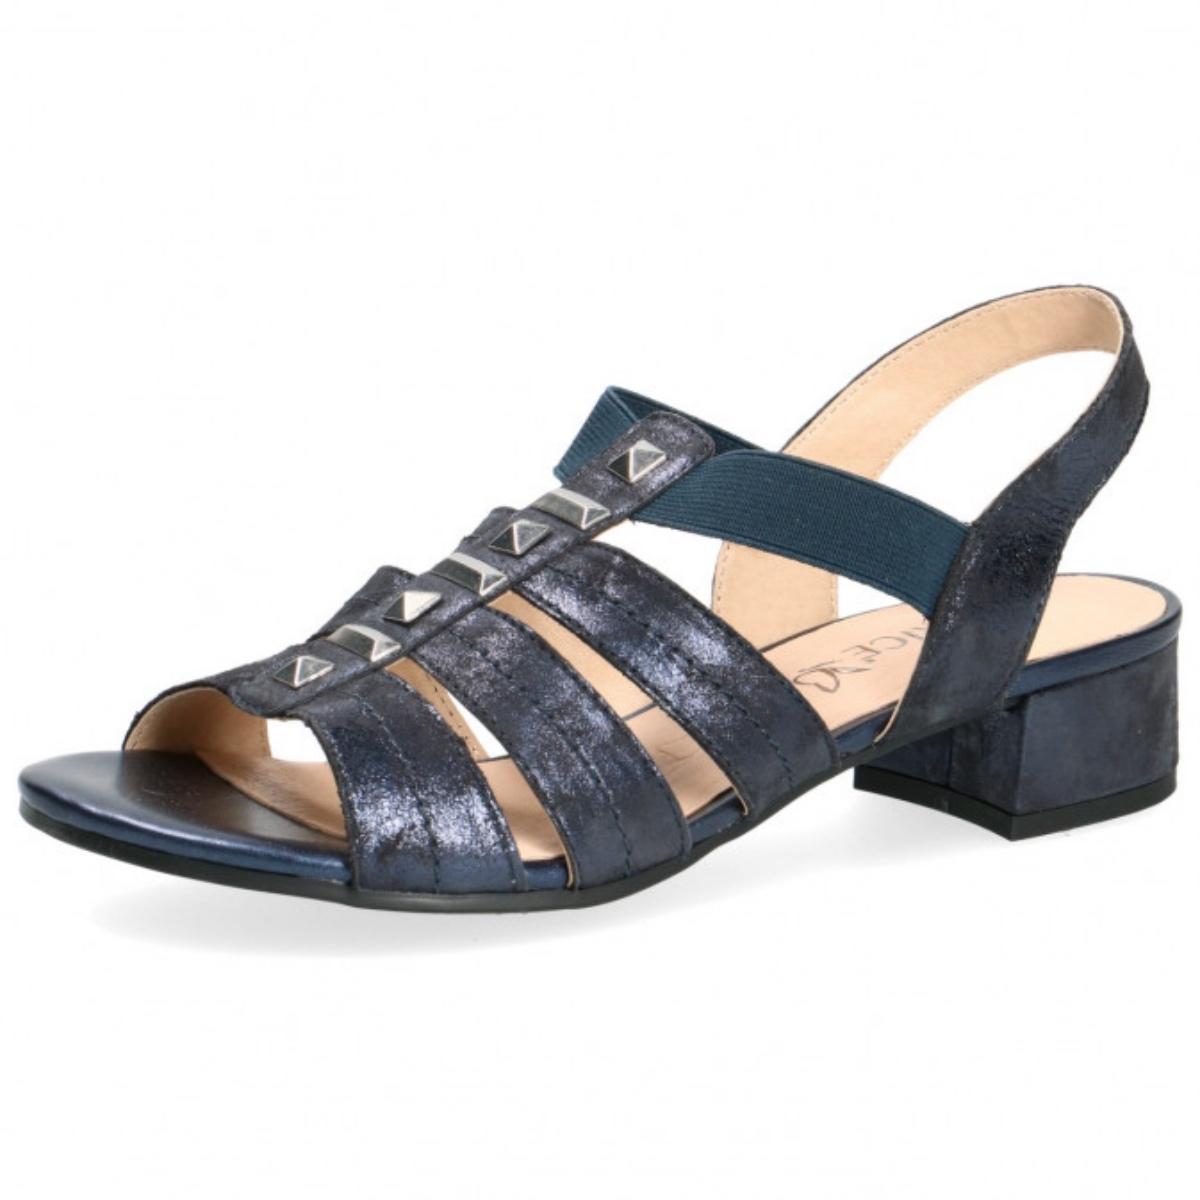 classic fit dirt cheap factory authentic Details about Caprice Ladies Strappy Sandals Sandals Sneakers 9-28204-22  Ocean Blue